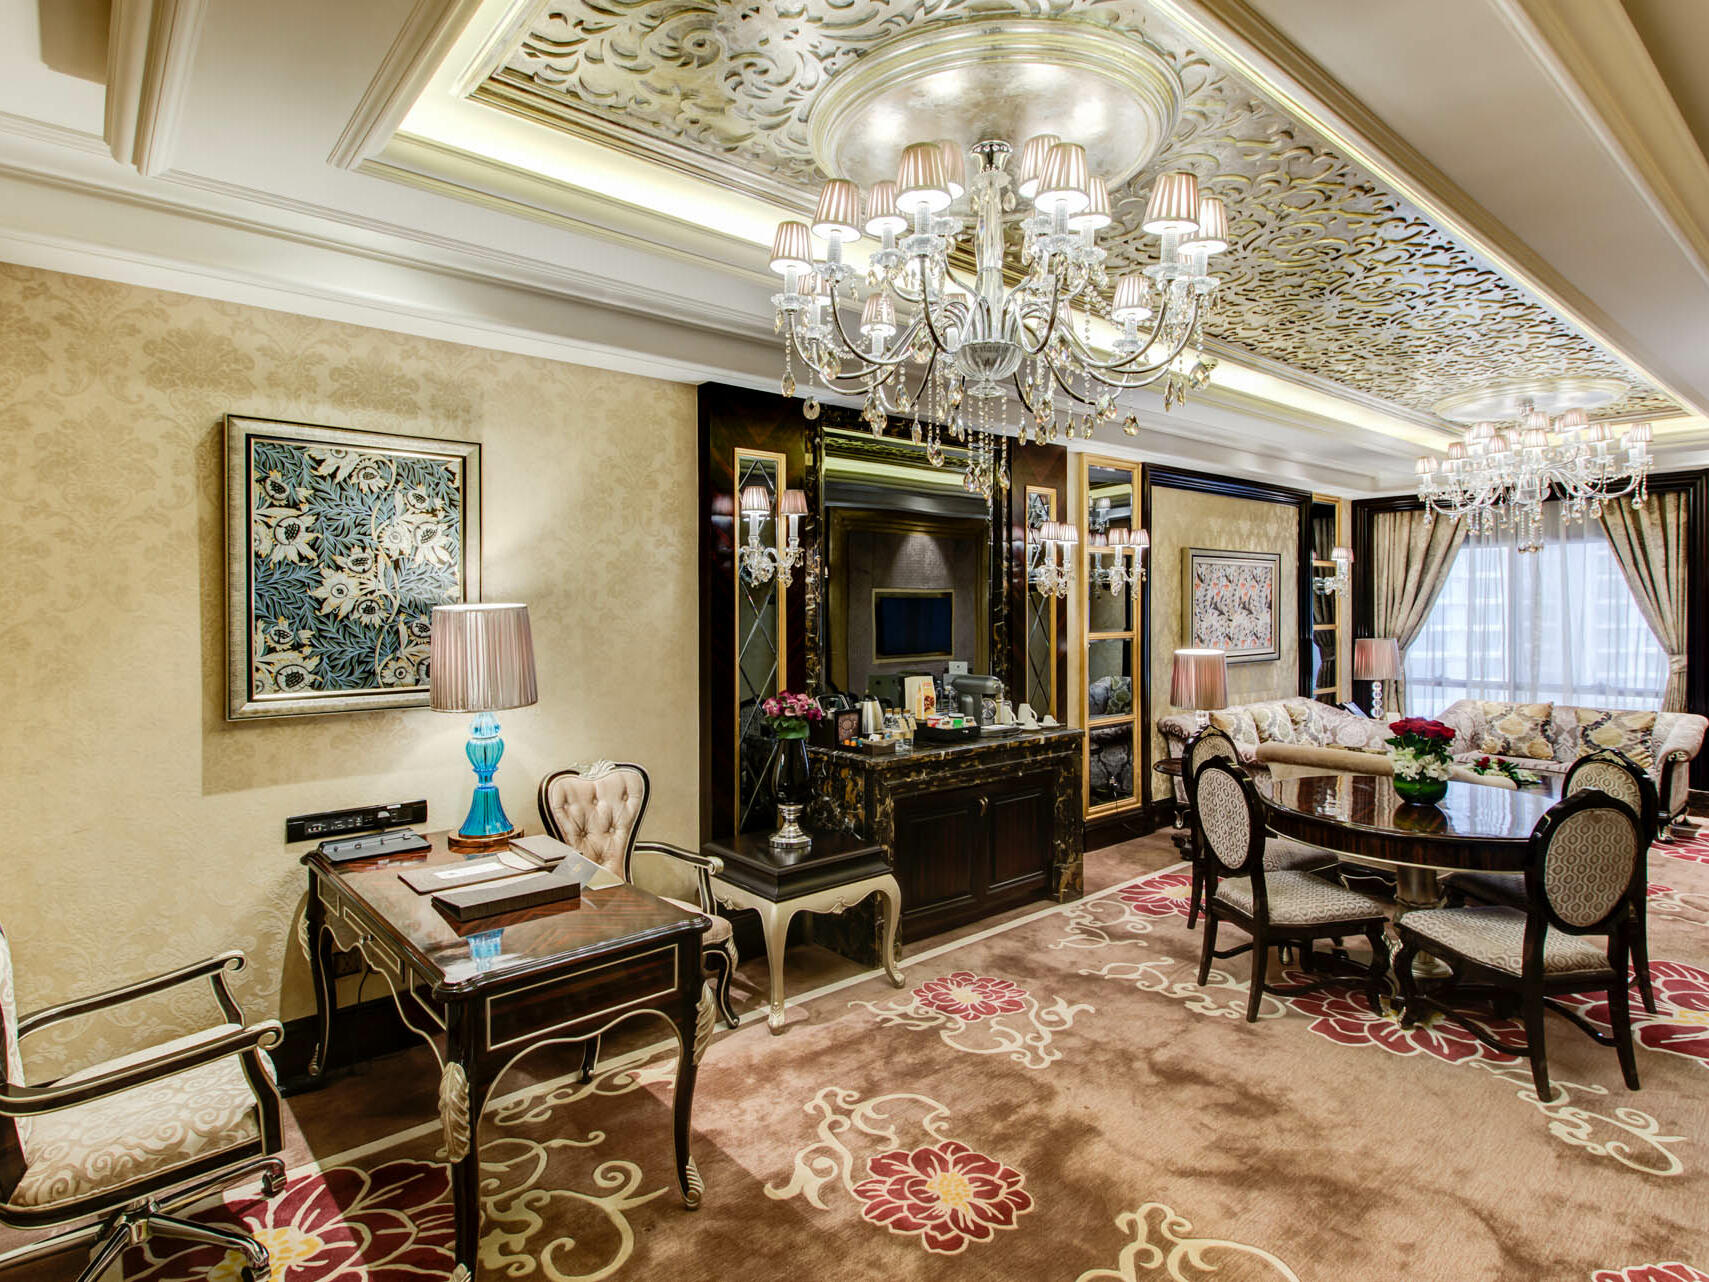 Presidential Suite at Narcissus Hotel & Spa Riyadh